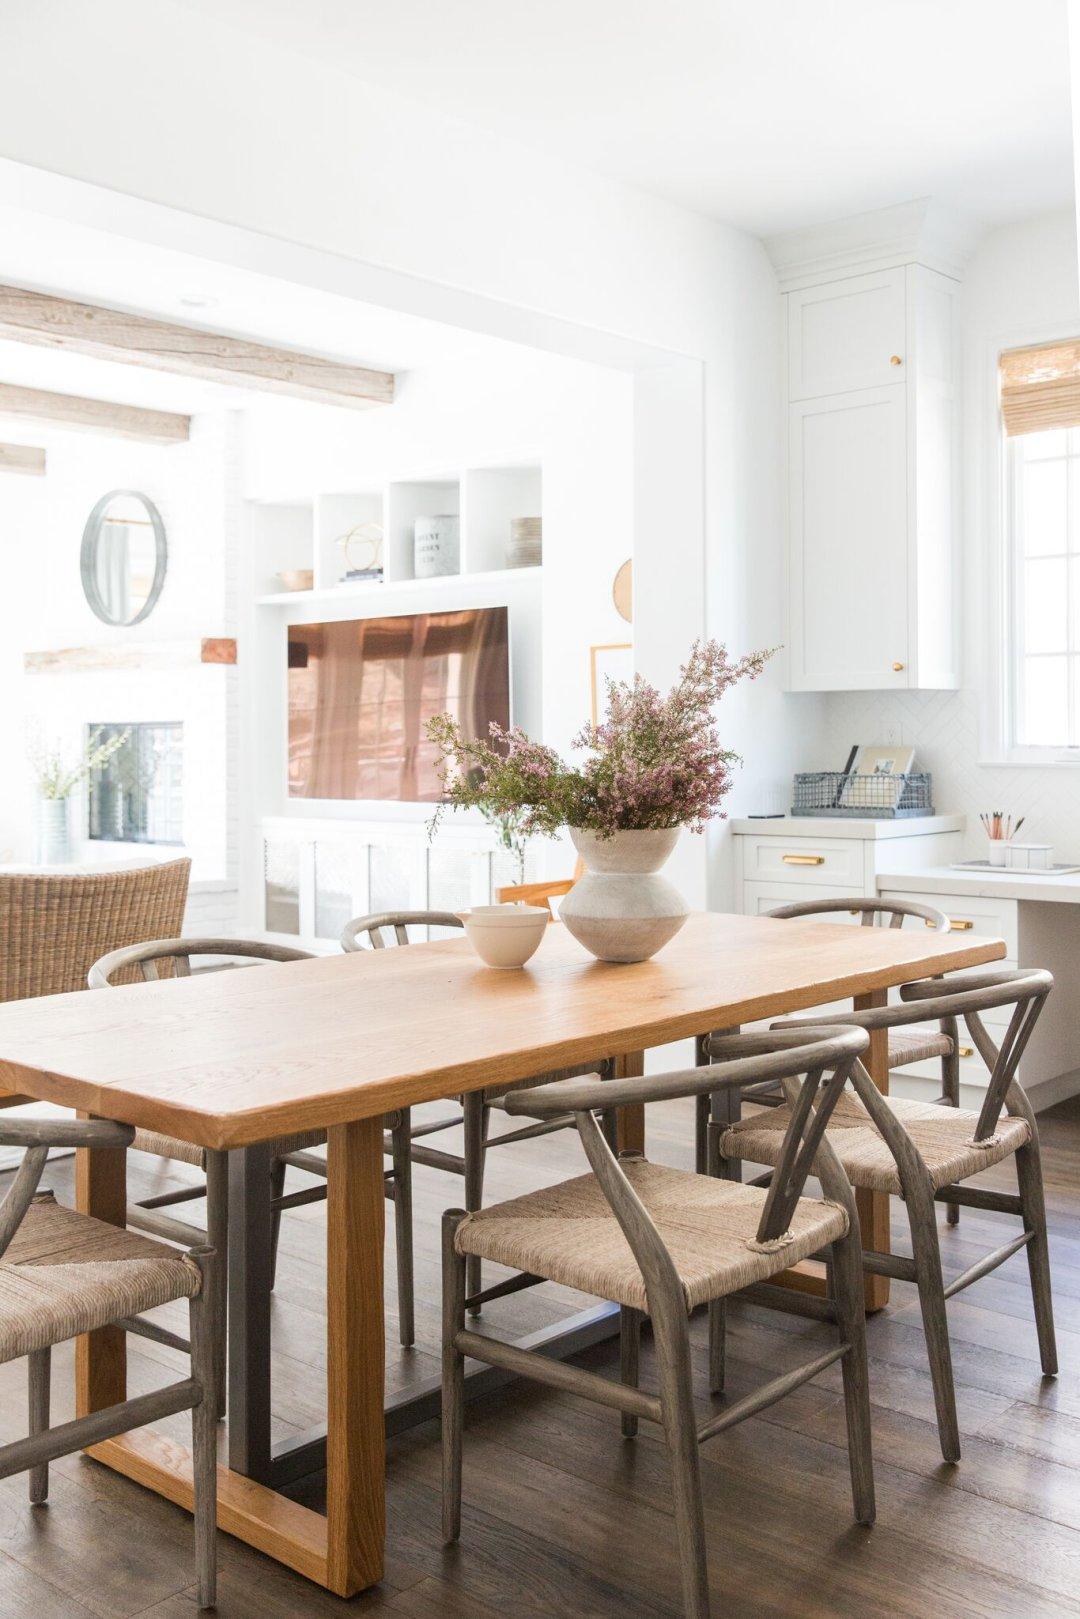 Calabasas Remodel: Kitchen + Laundry Room Reveal — STUDIO MCGEE